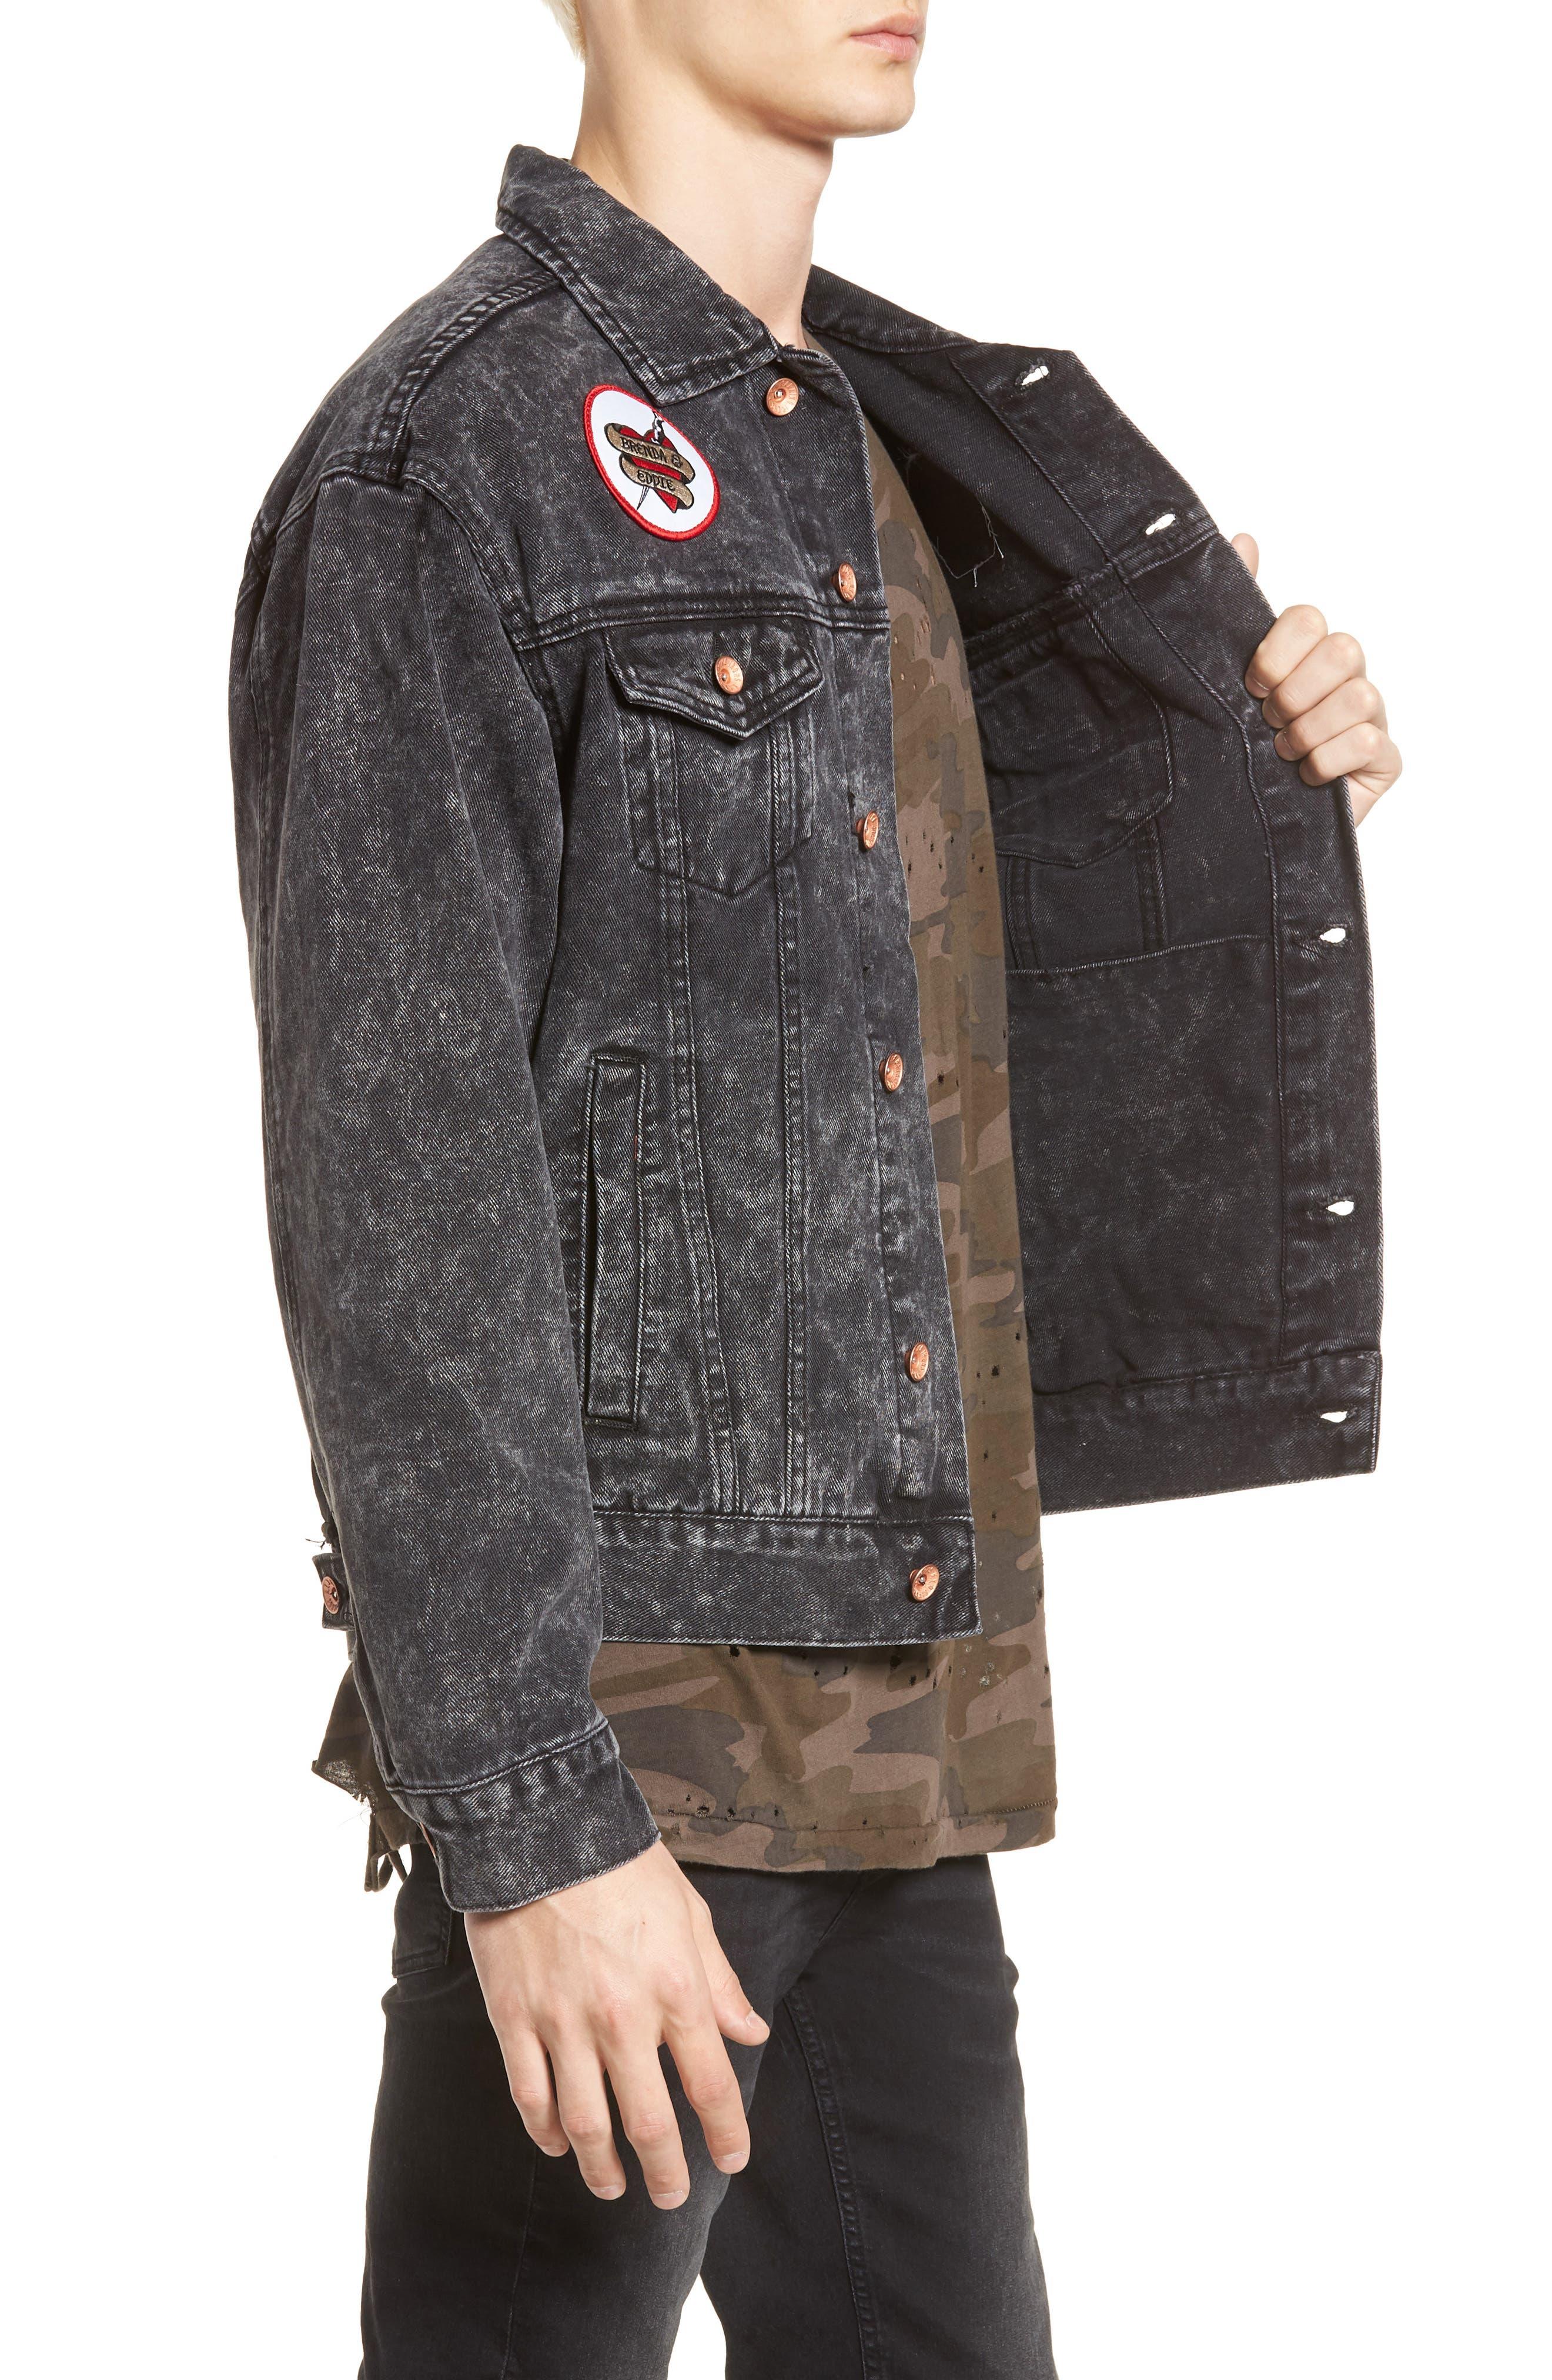 Billy Joel At the Garden Denim Jacket,                             Alternate thumbnail 3, color,                             Black Acid